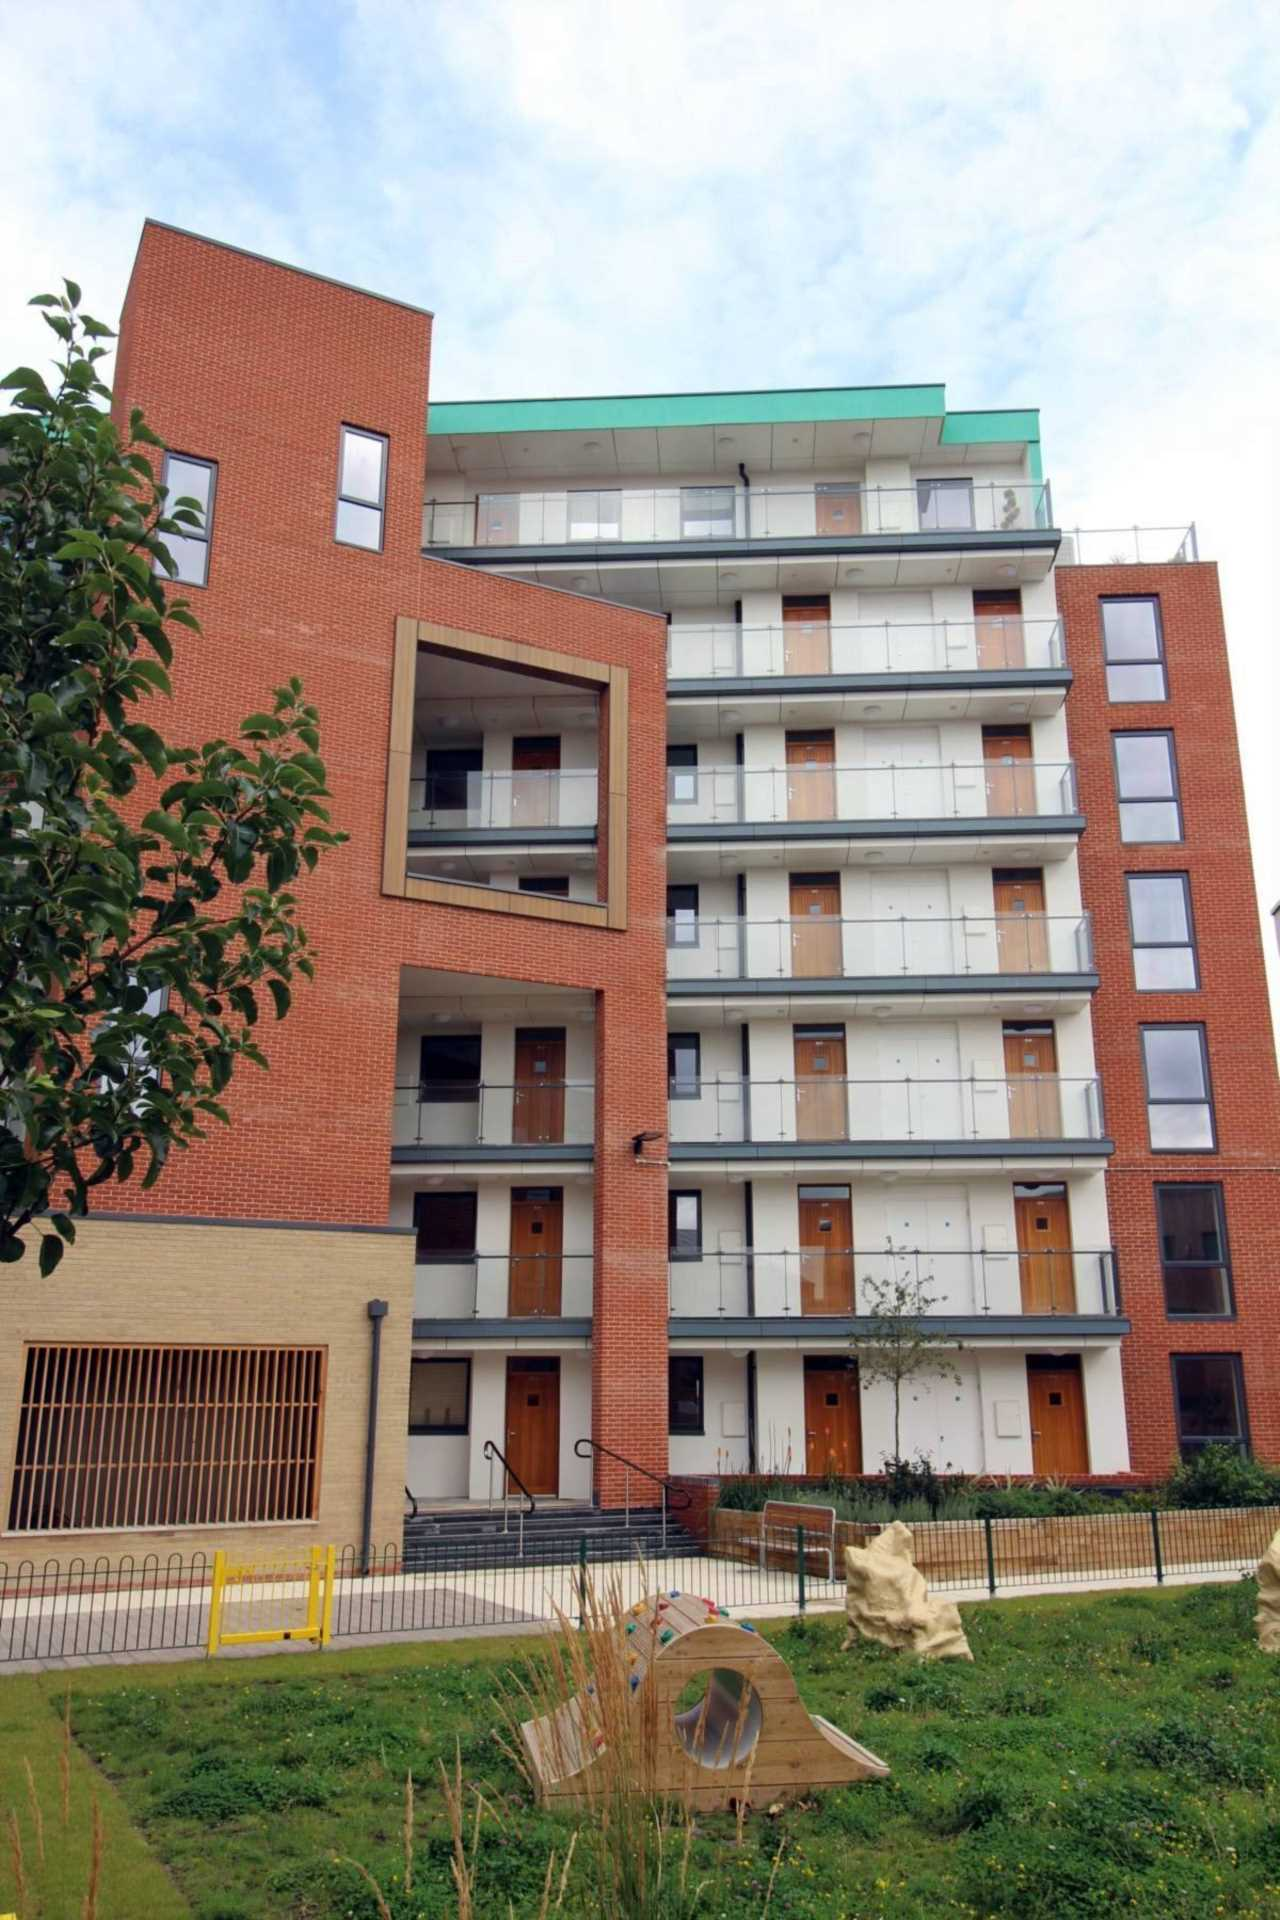 Property To Rent In Ipswich Ip